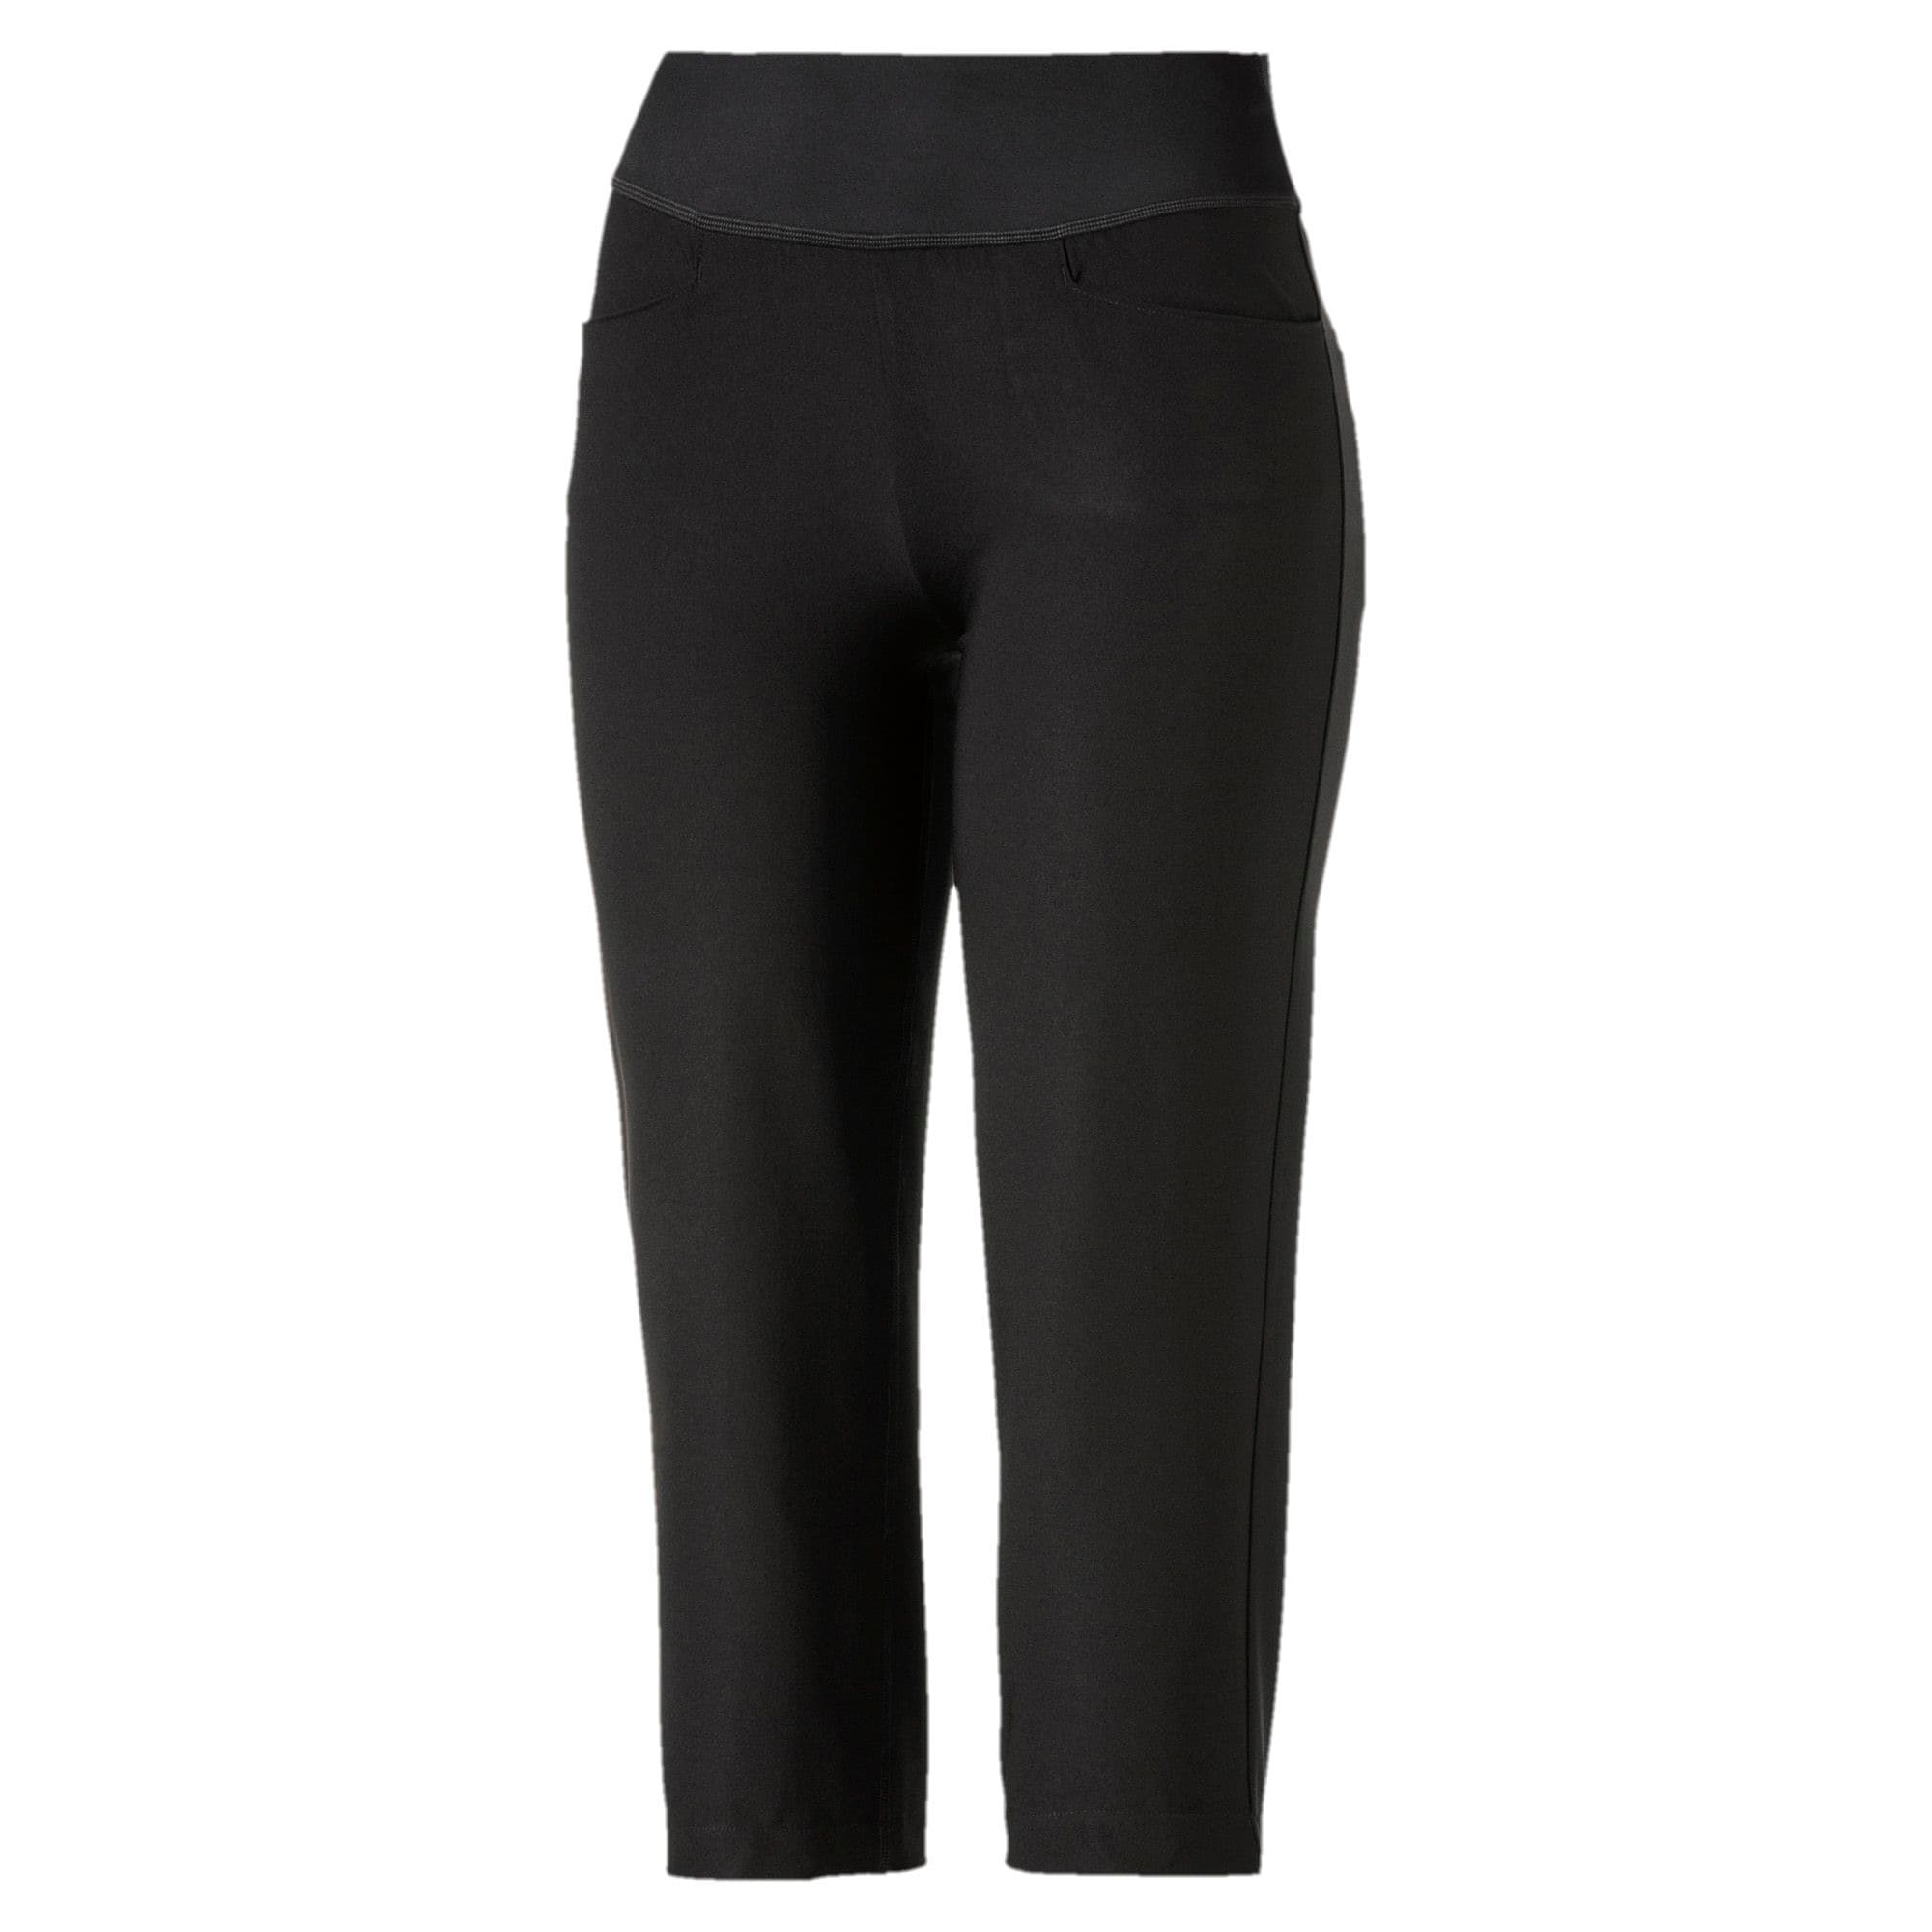 Thumbnail 1 of Golf Women's PWRSHAPE Capri Pants, Puma Black, medium